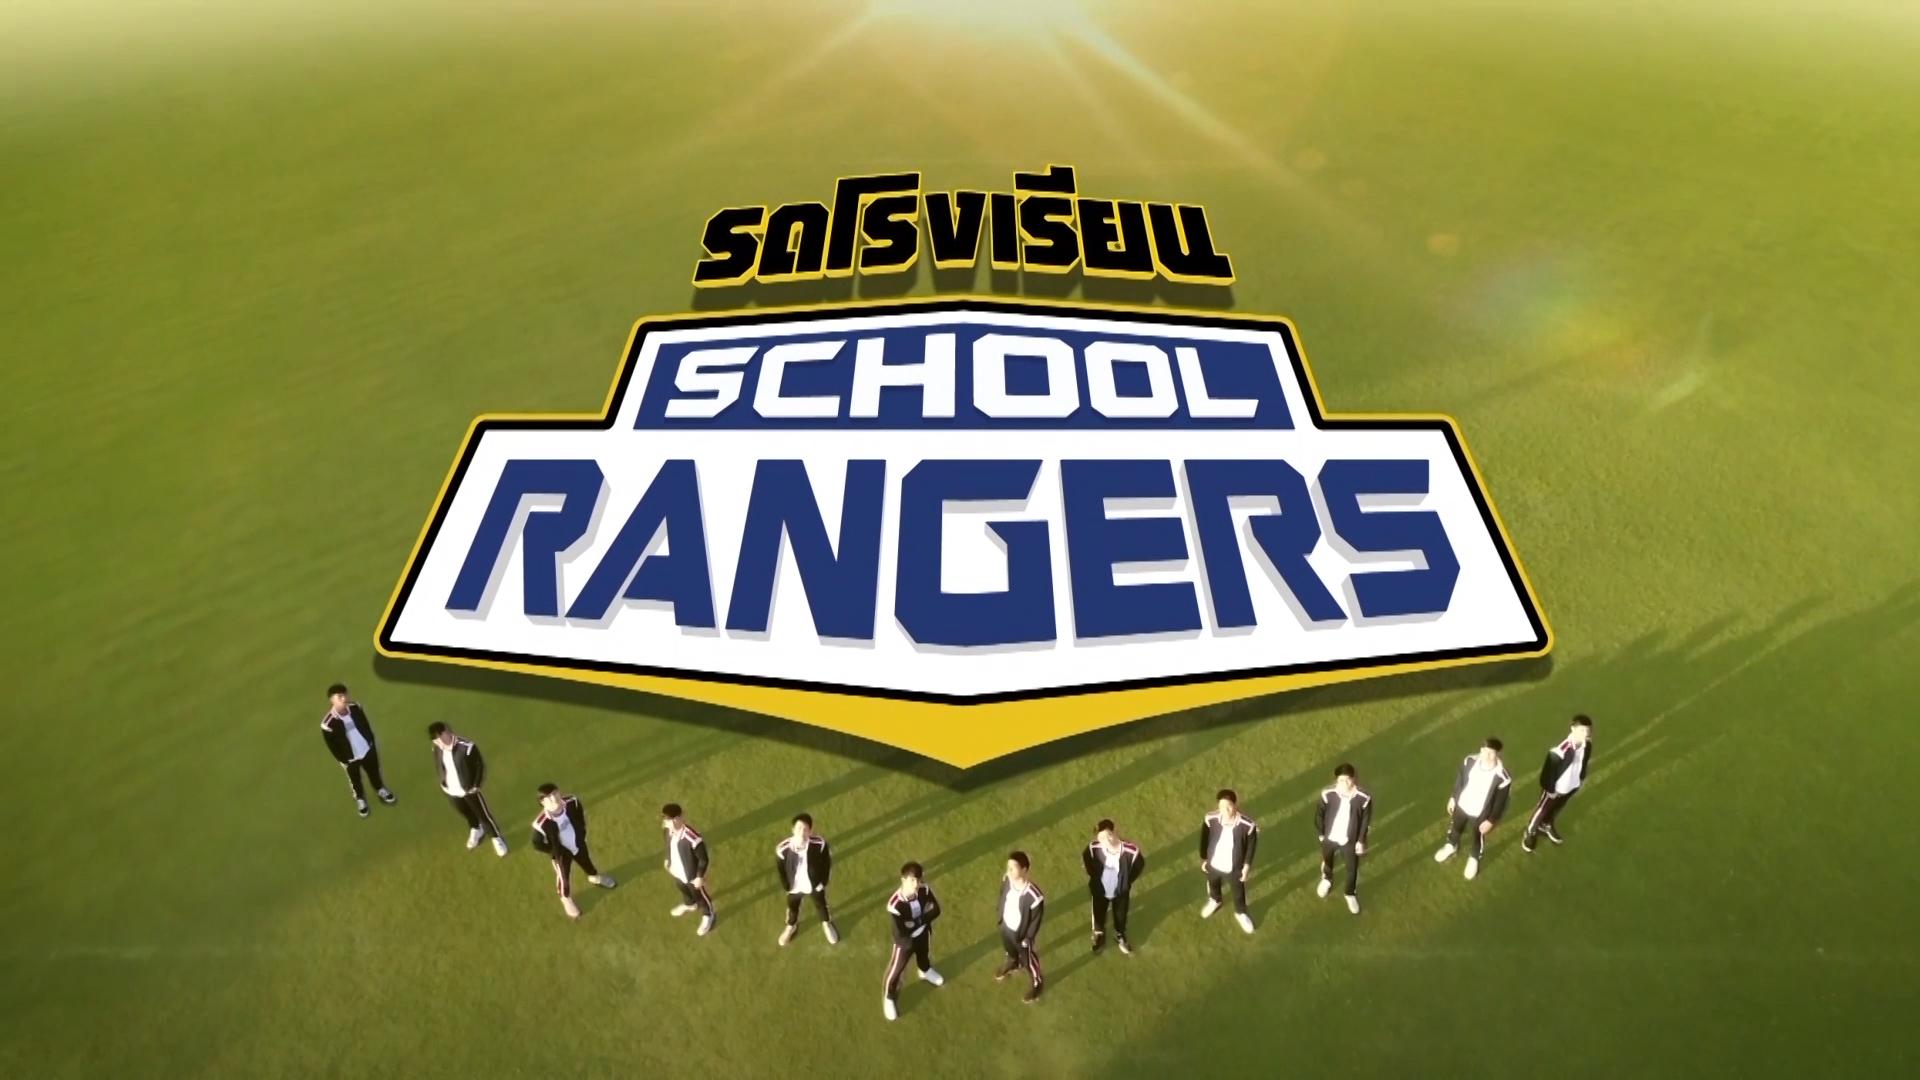 『School Rangers』  (C)GMMTV